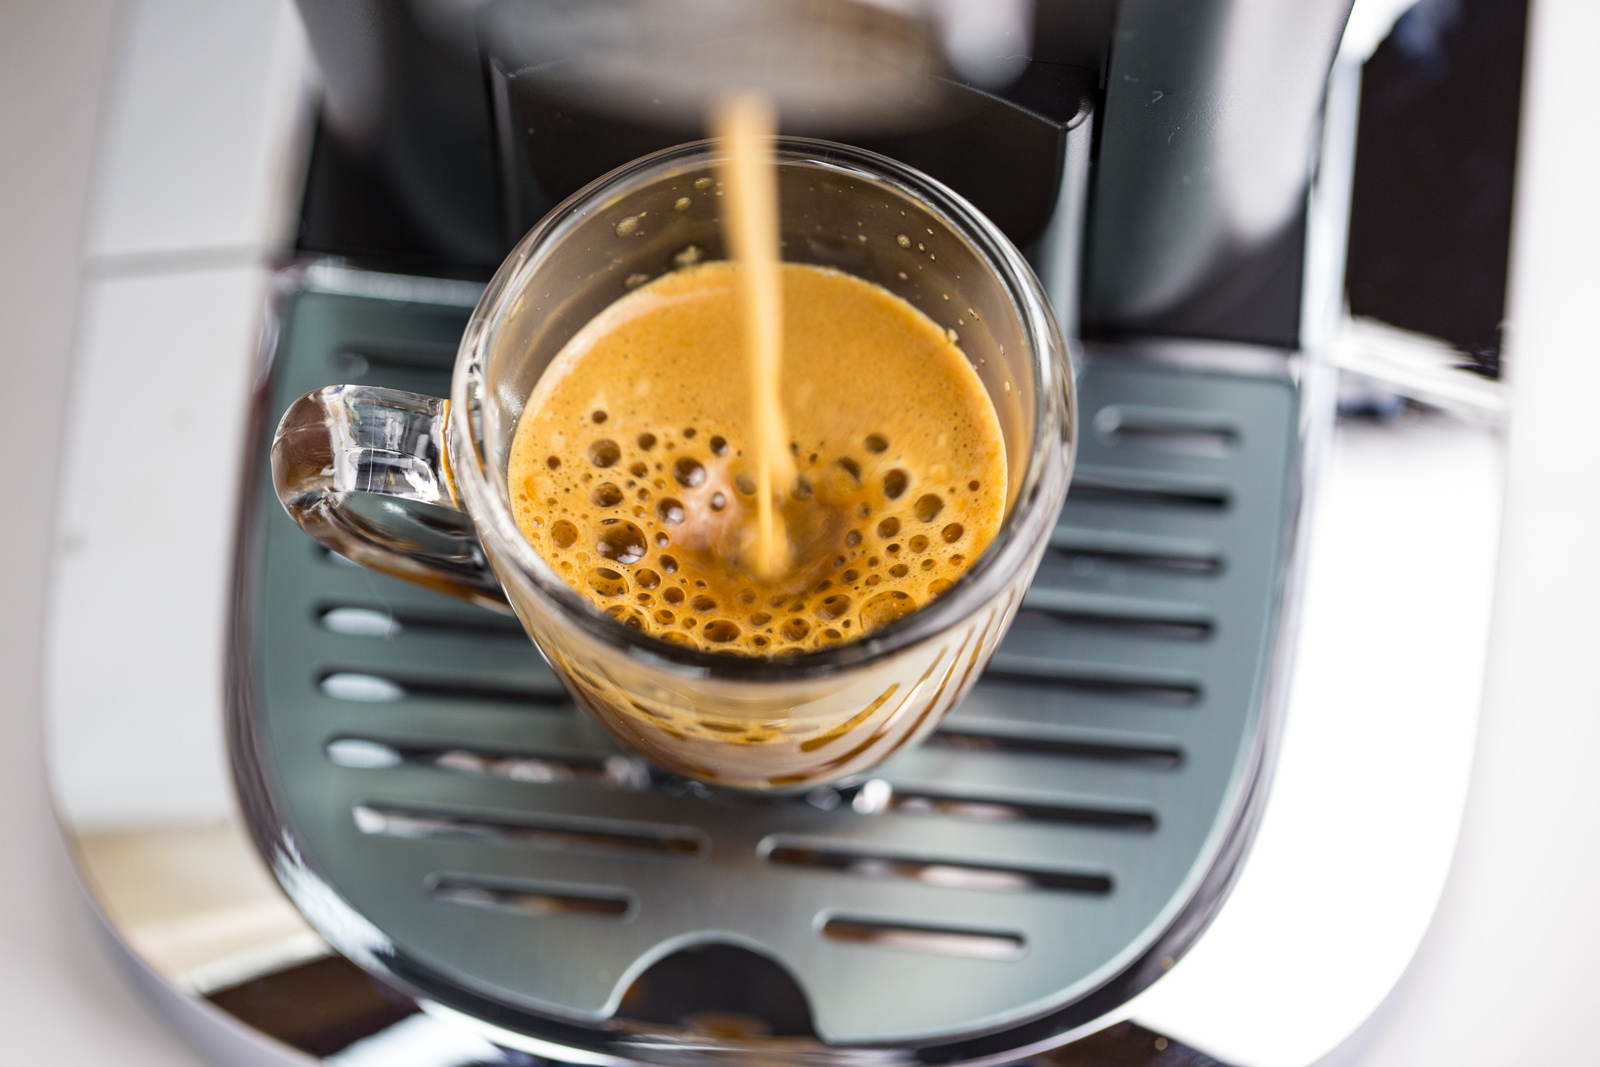 Nadja_Nemetz_Rezept_iced_caffe_latte_vanille_eis_vanilleeis_tchibo_eduscho_4